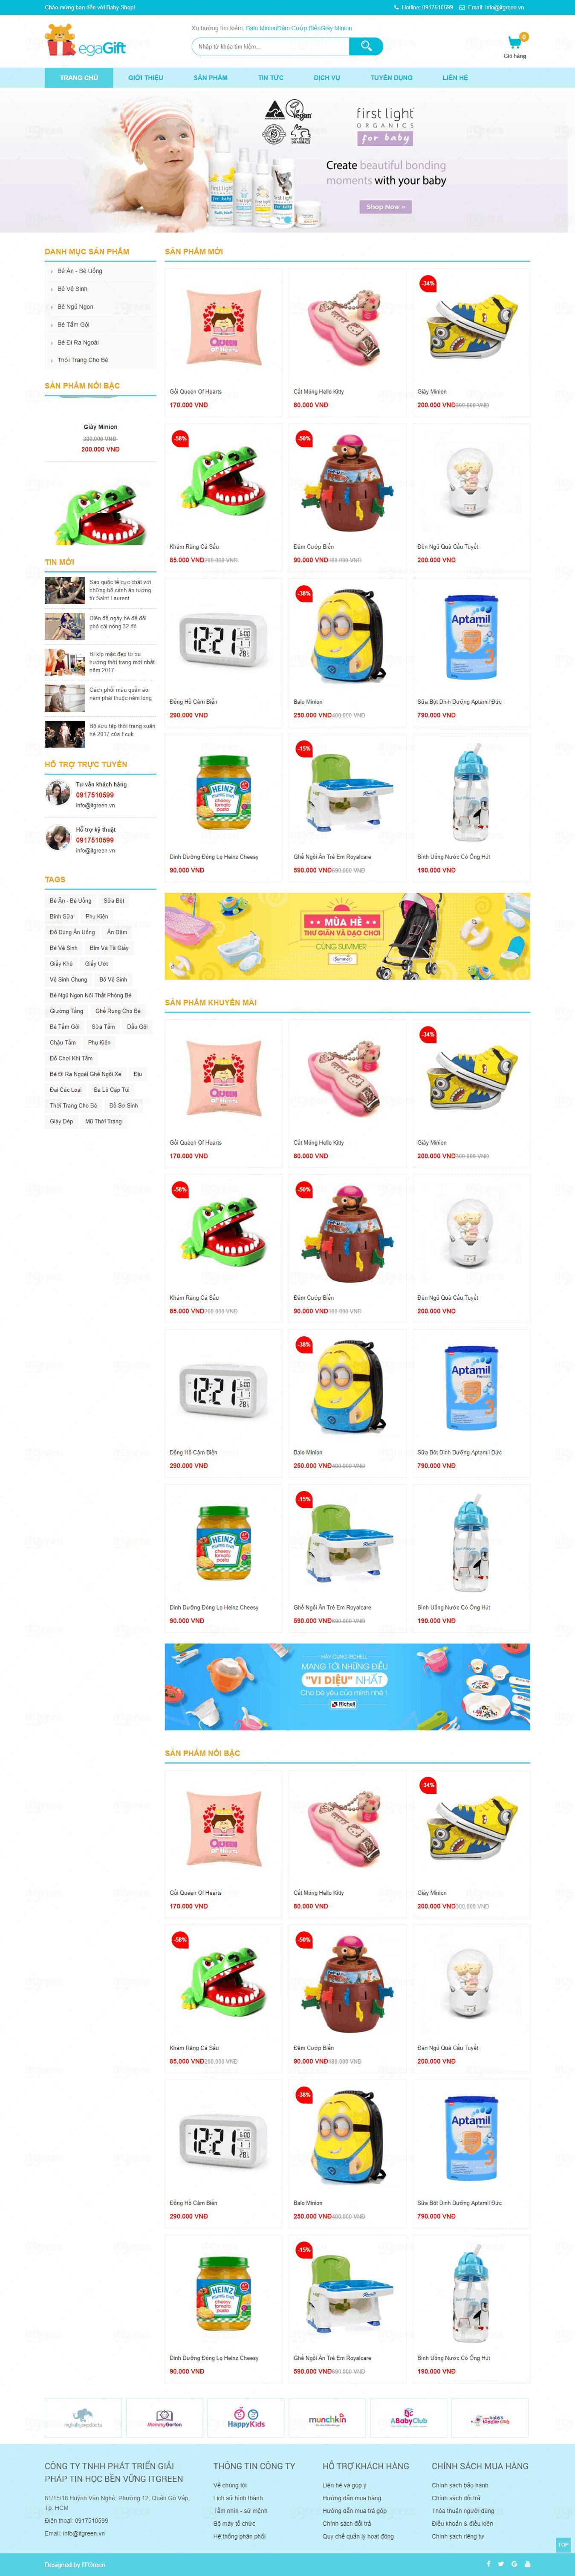 Thiết kế website Thiết kế website sản phẩm 00046